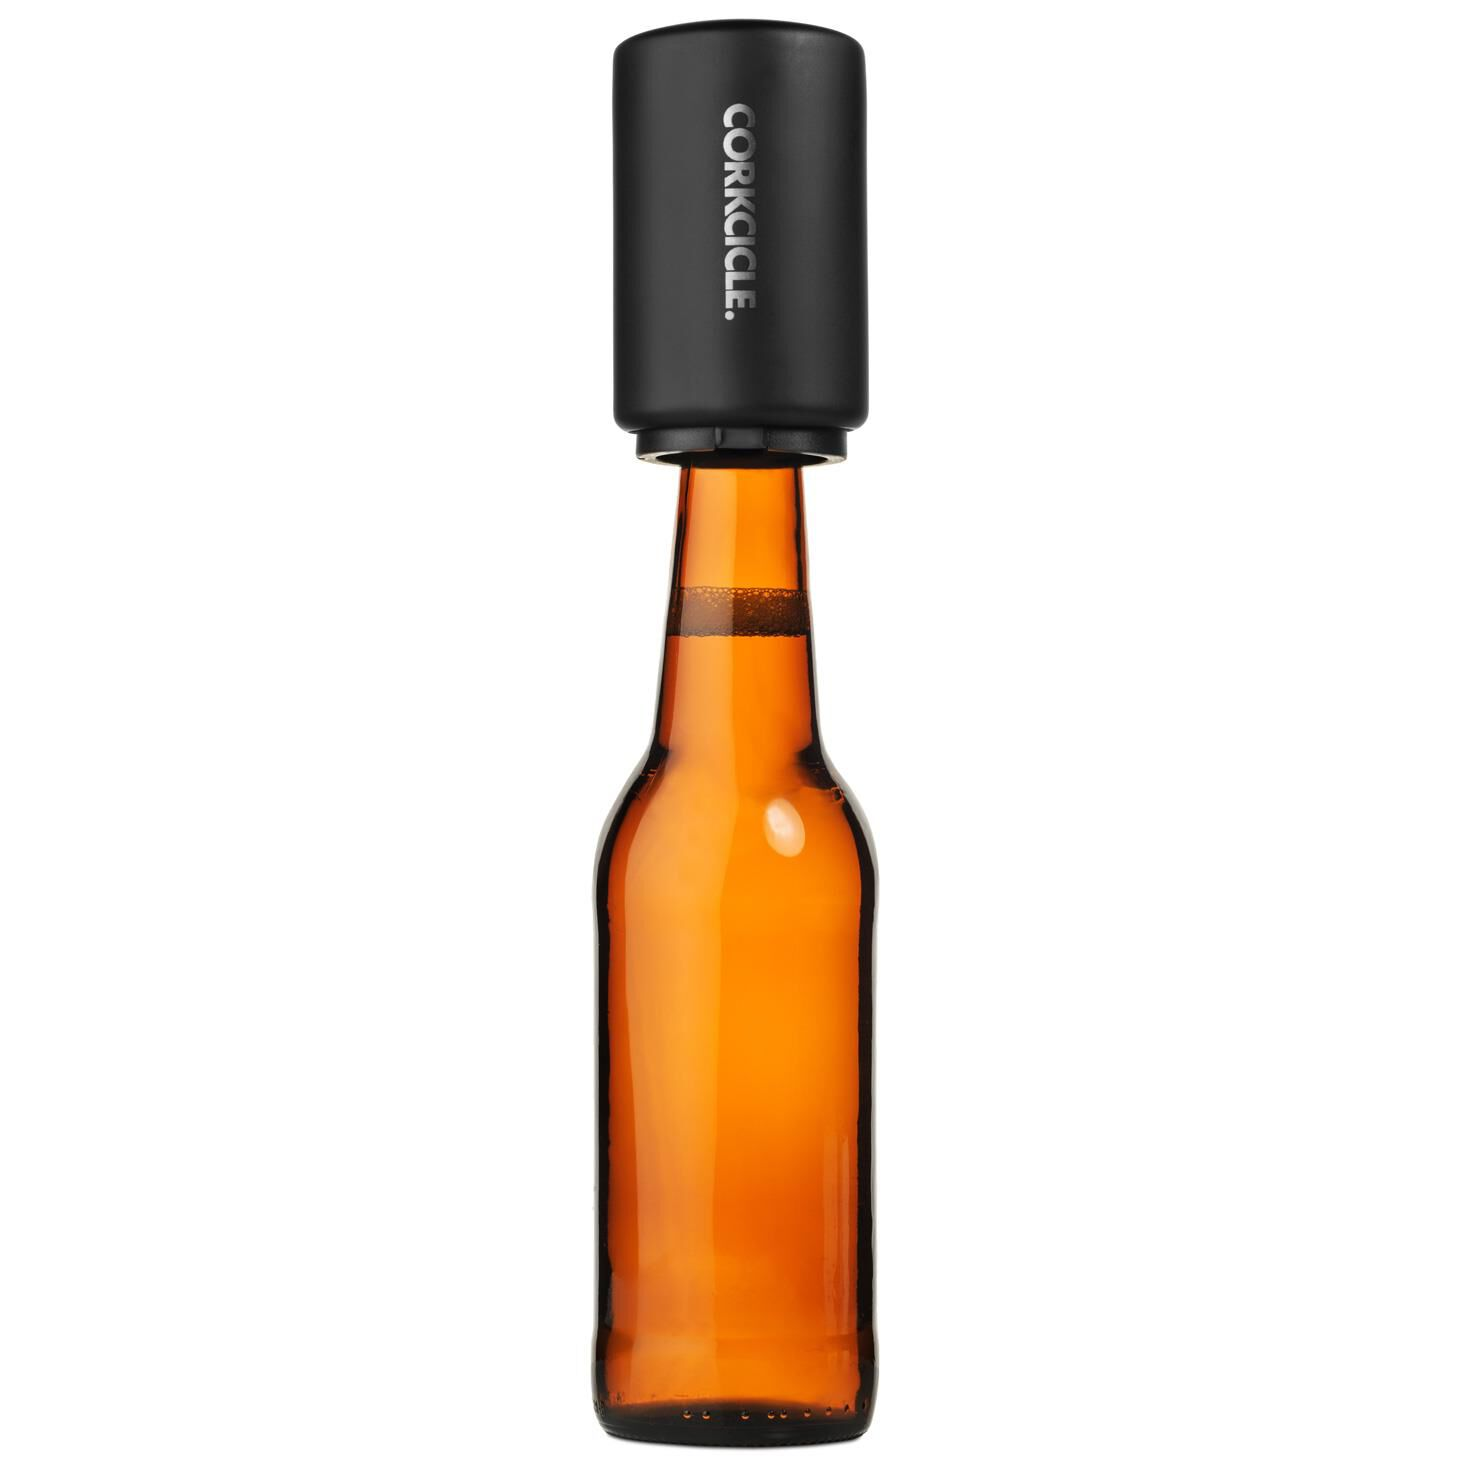 corkcicle decapitator bottle opener corkcicle decapitator bottle opener